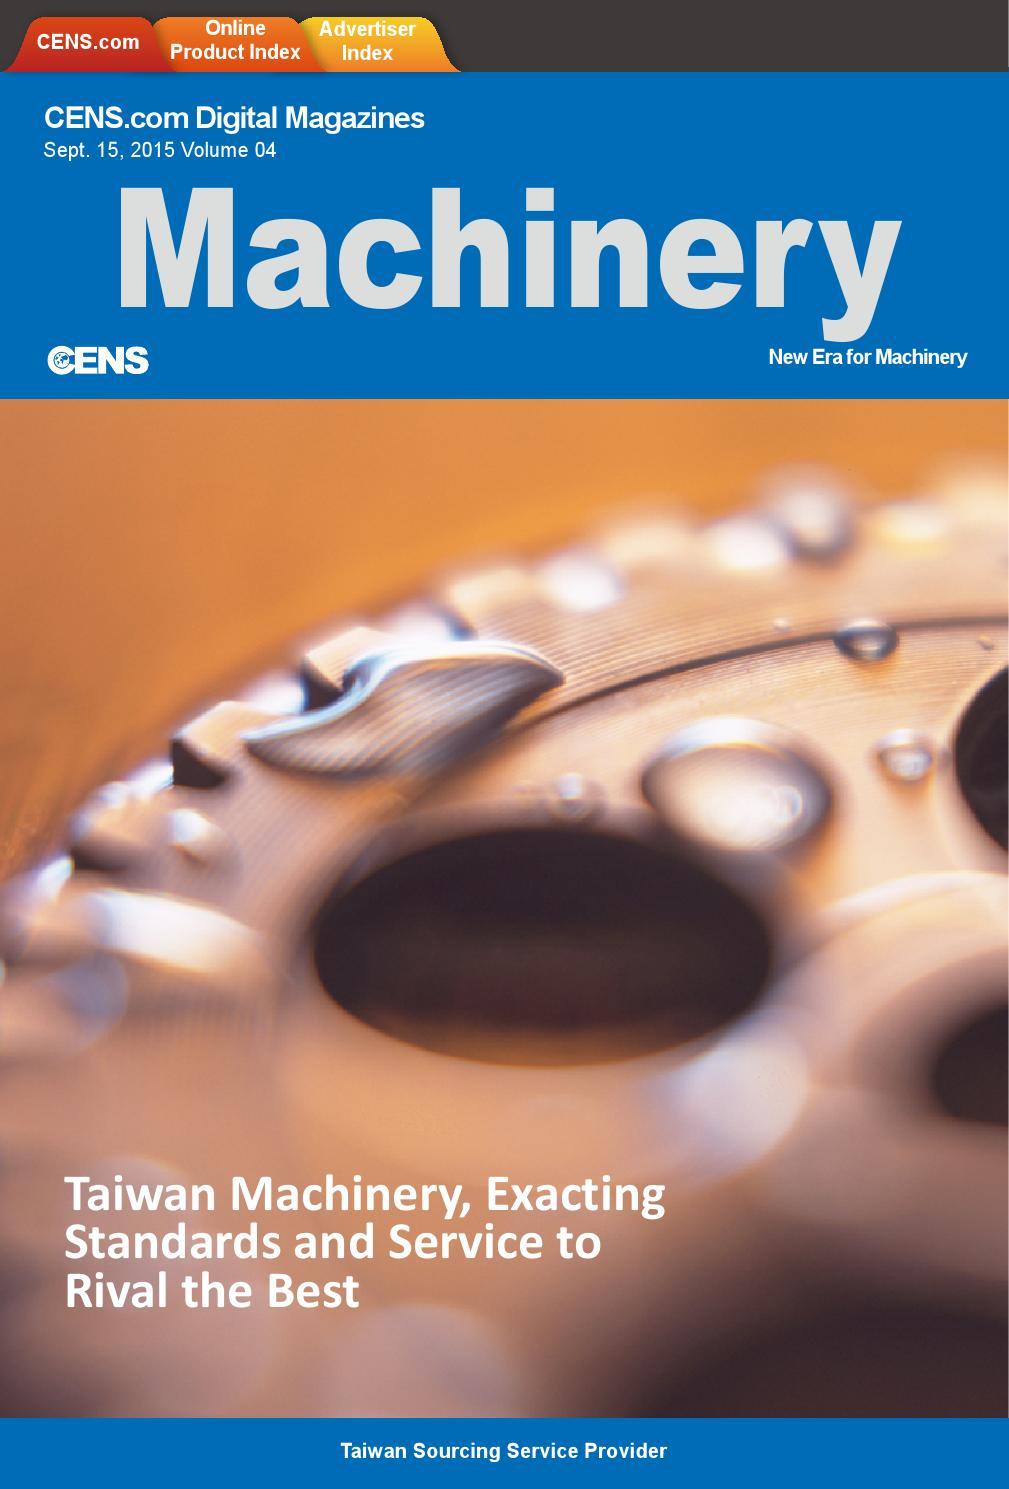 201509 Machinery Vol 4 Martina By ƞ—玫君 Issuu